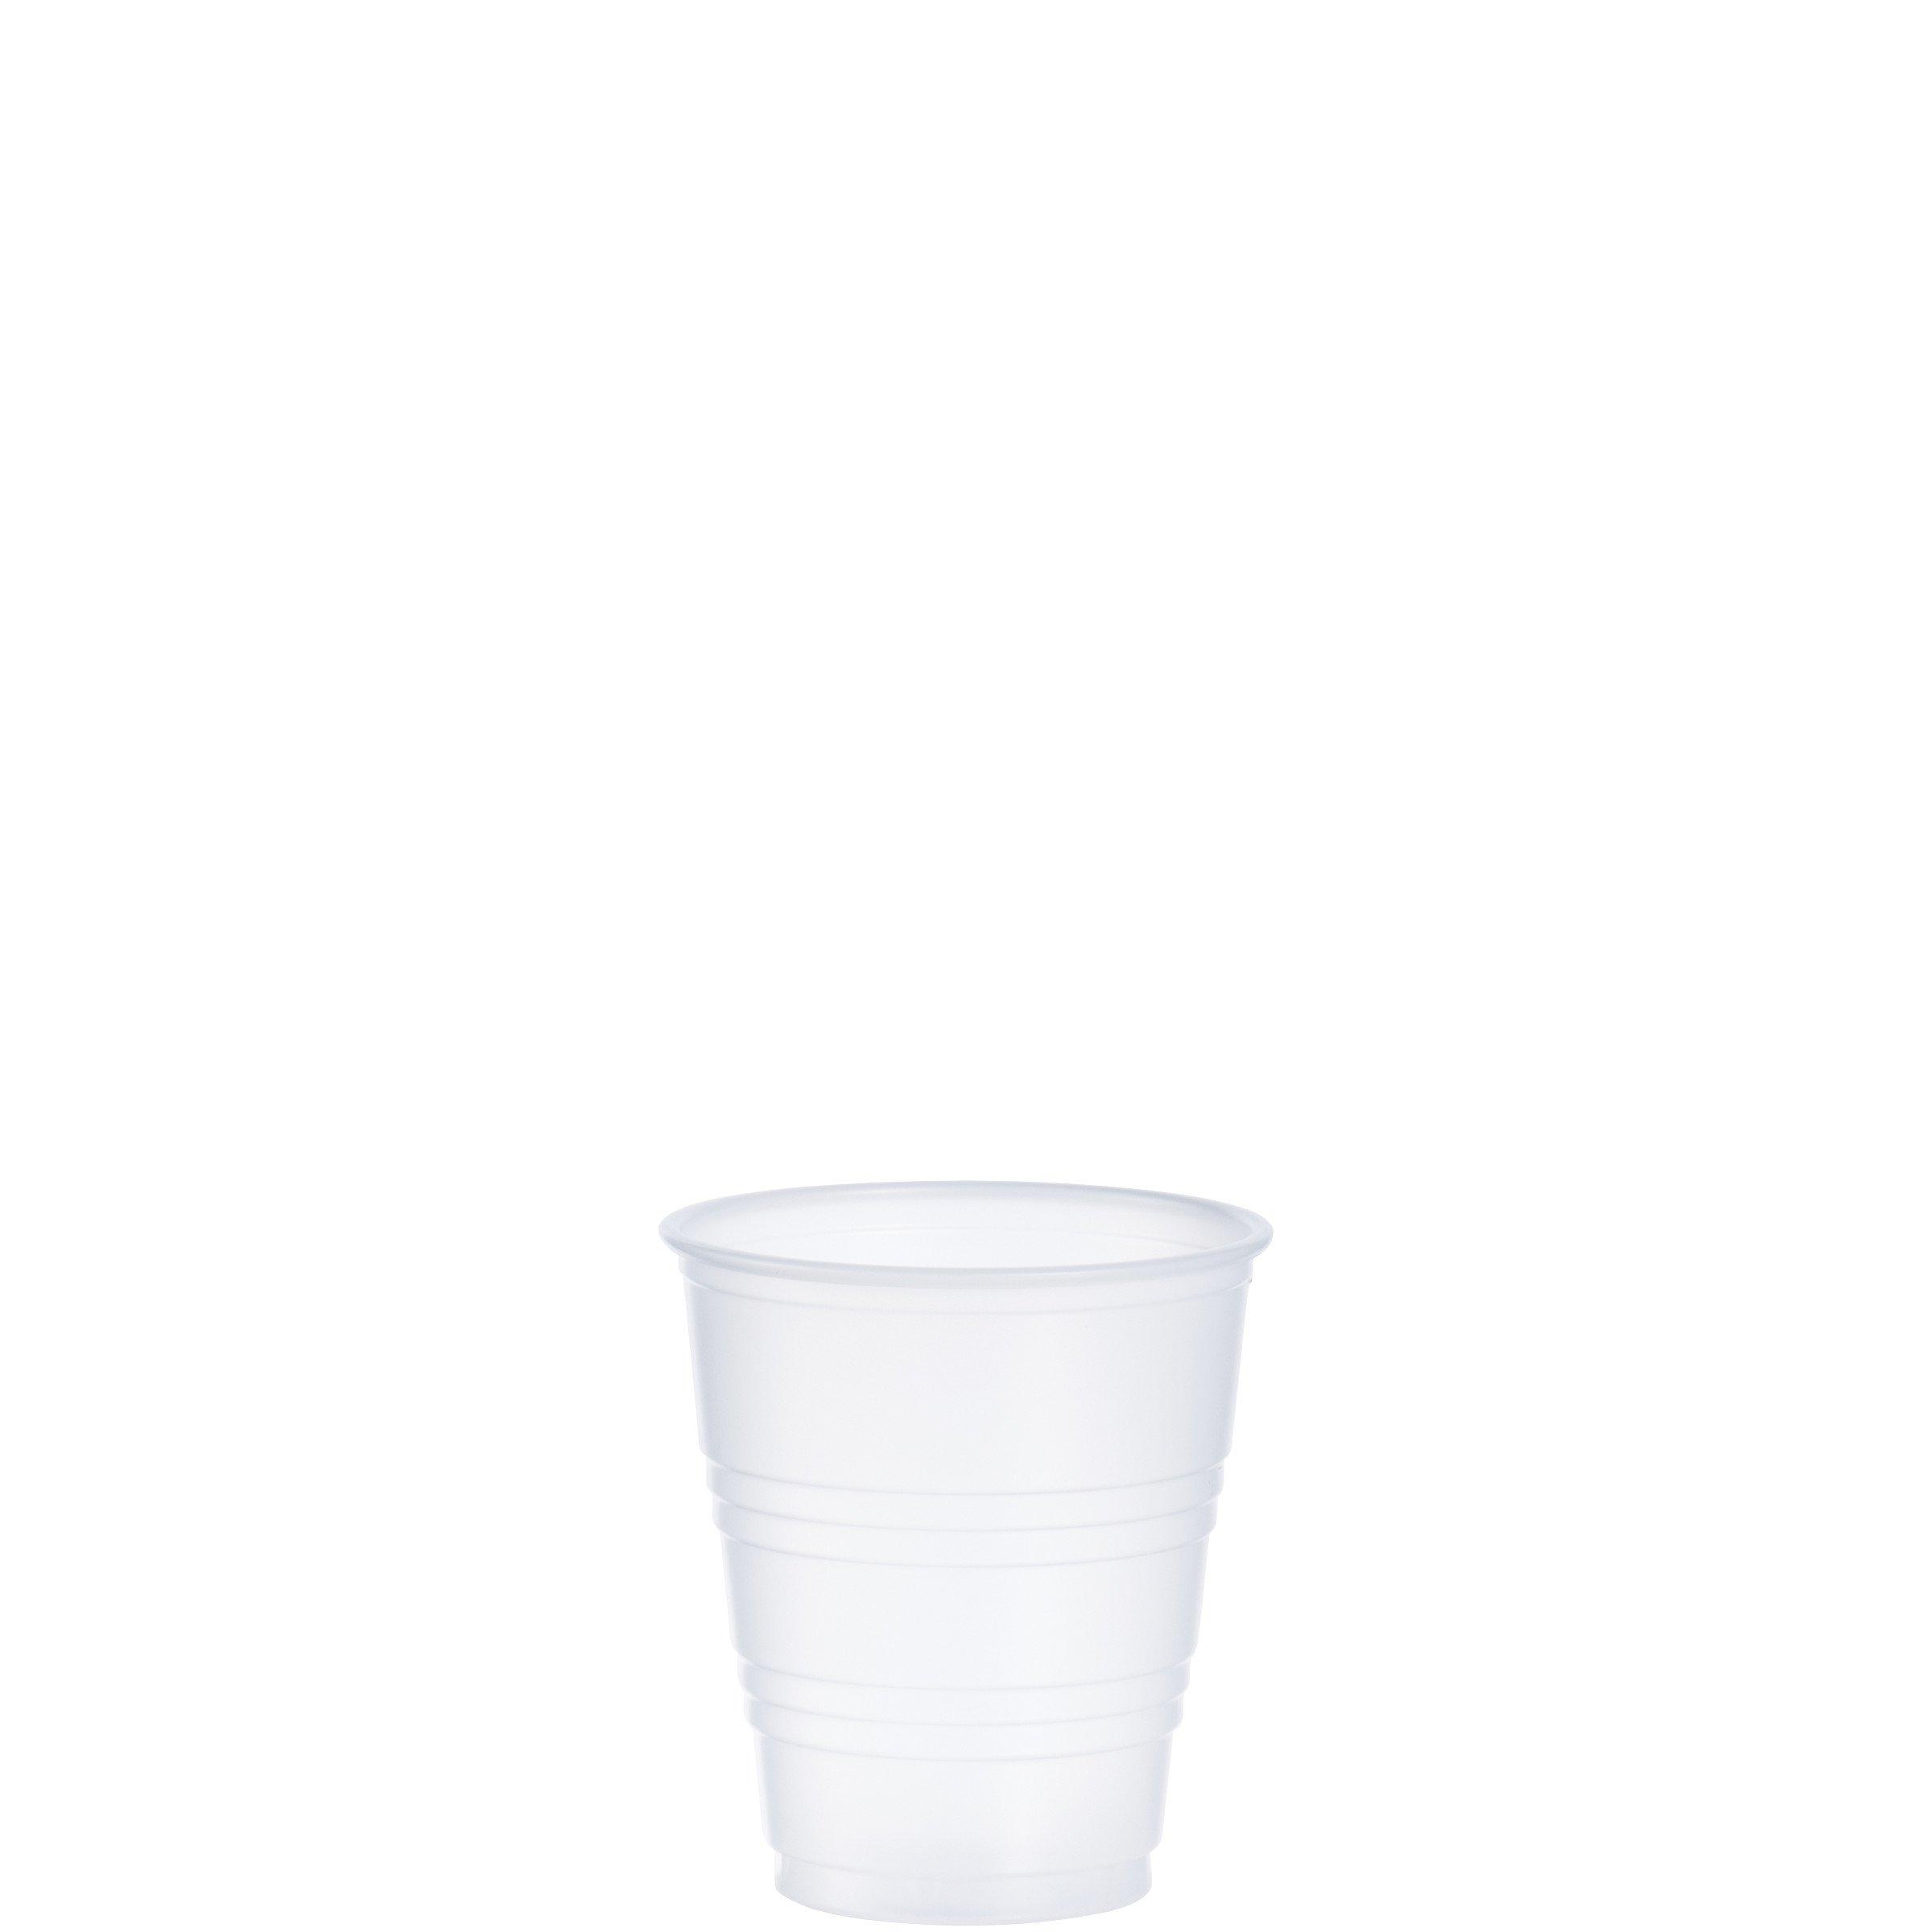 Dart Y5 5oz Cold Cup Tanslucent (Case of 2500)